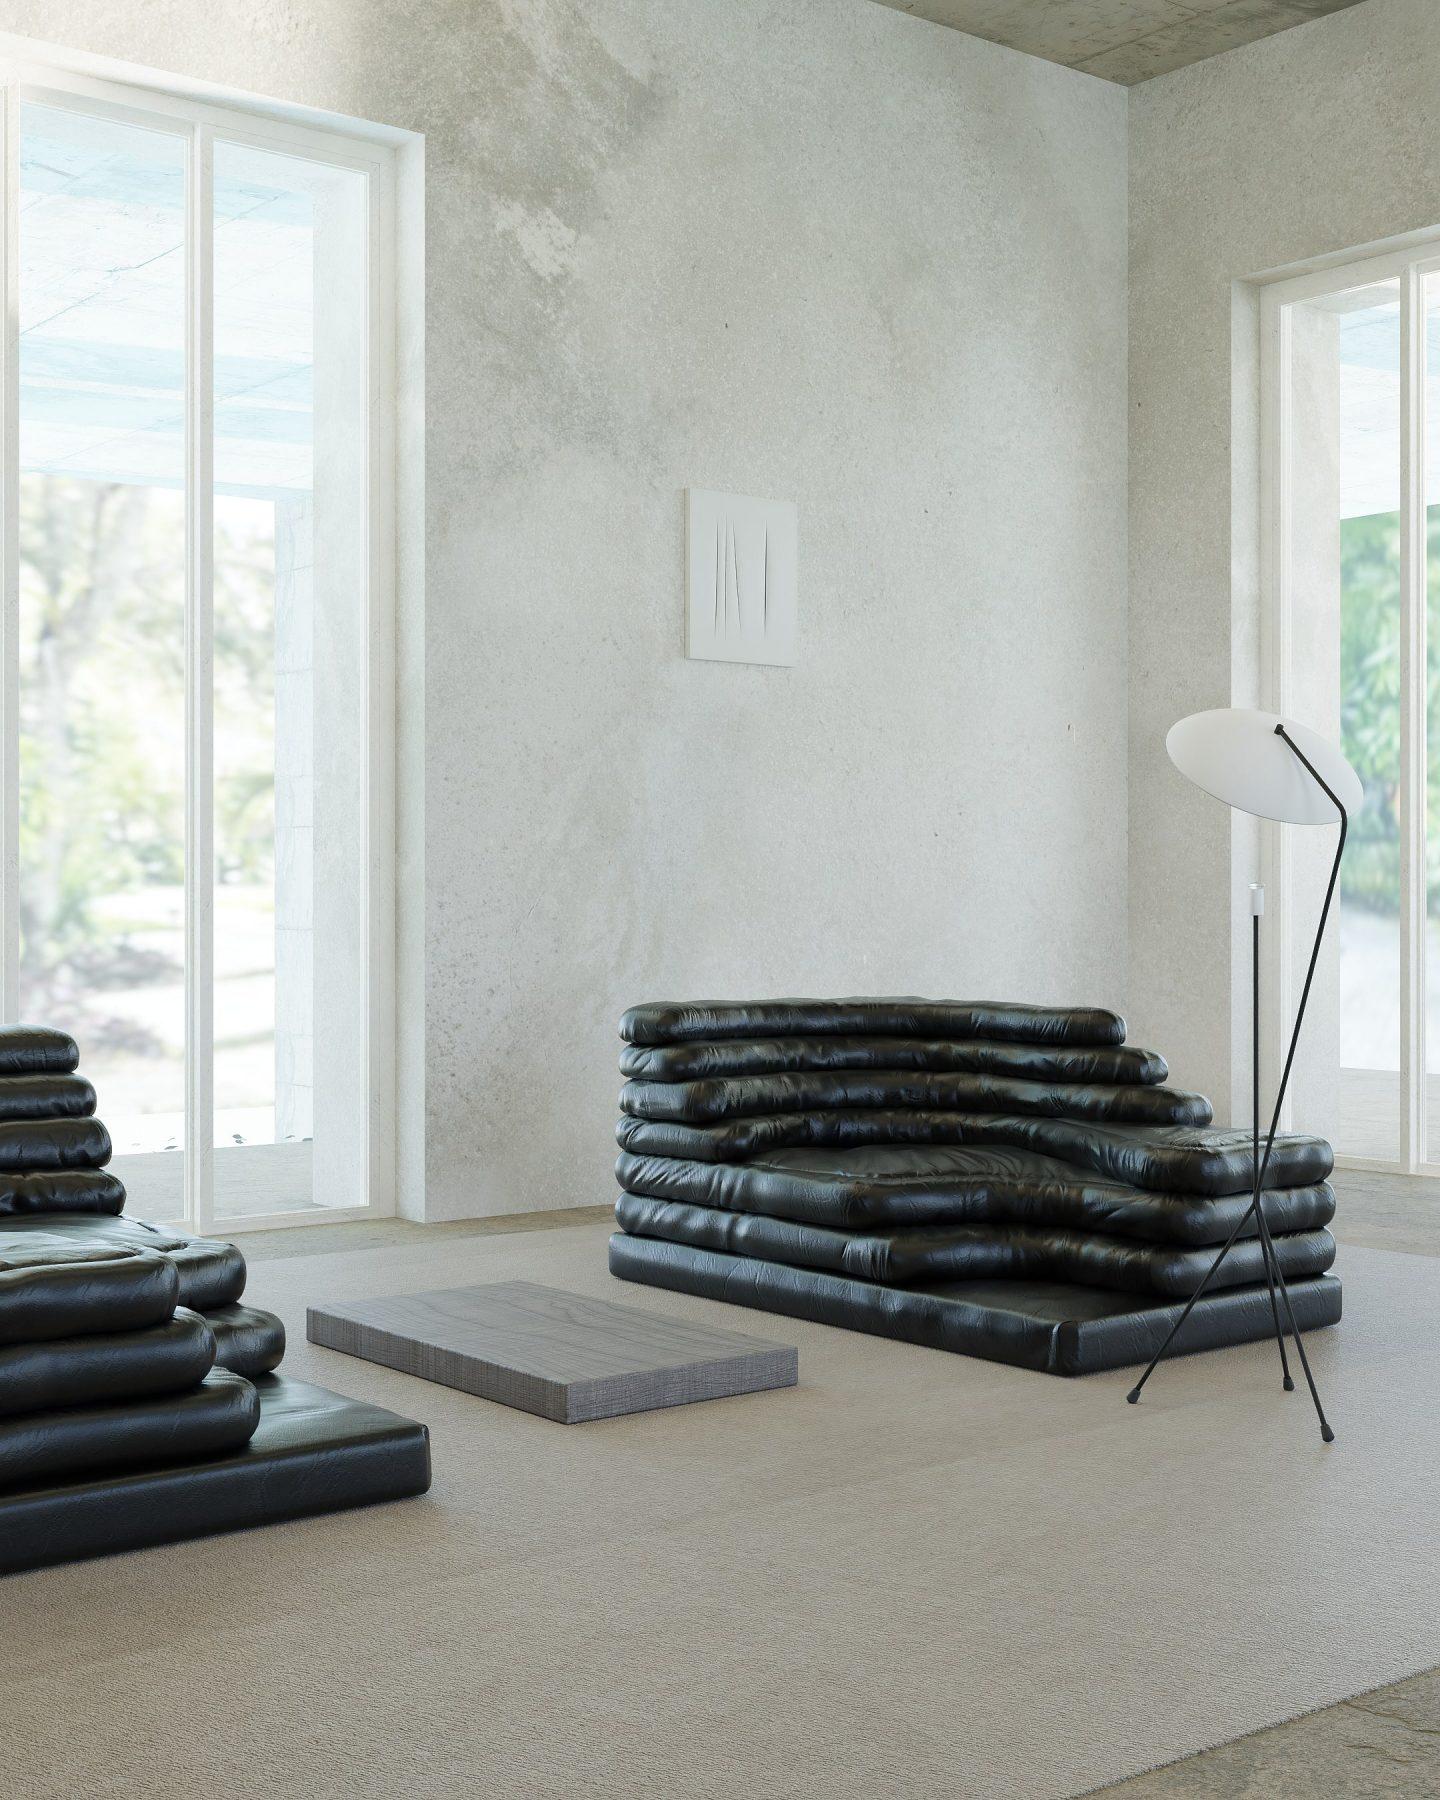 IGNANT-Design-Interview-Osminina-20